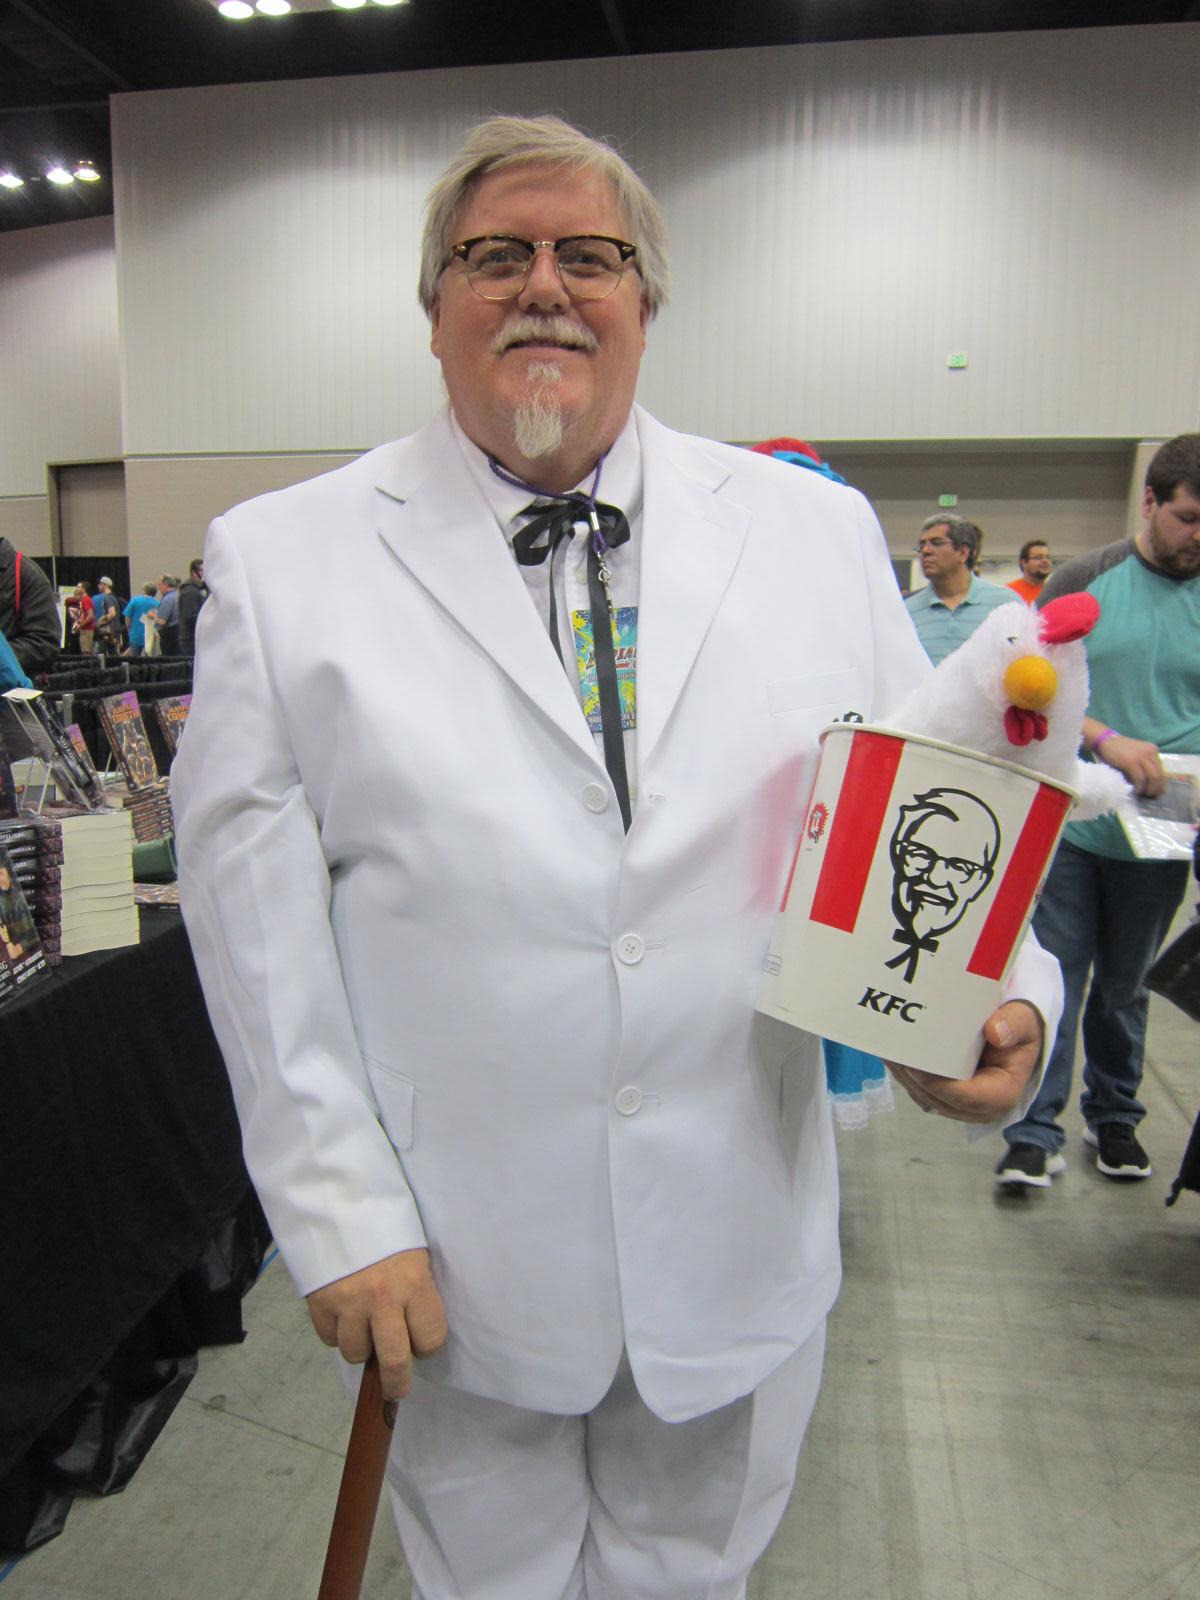 Indiana Comic Con 2017 Photos Part 3 of 4 More Saturday